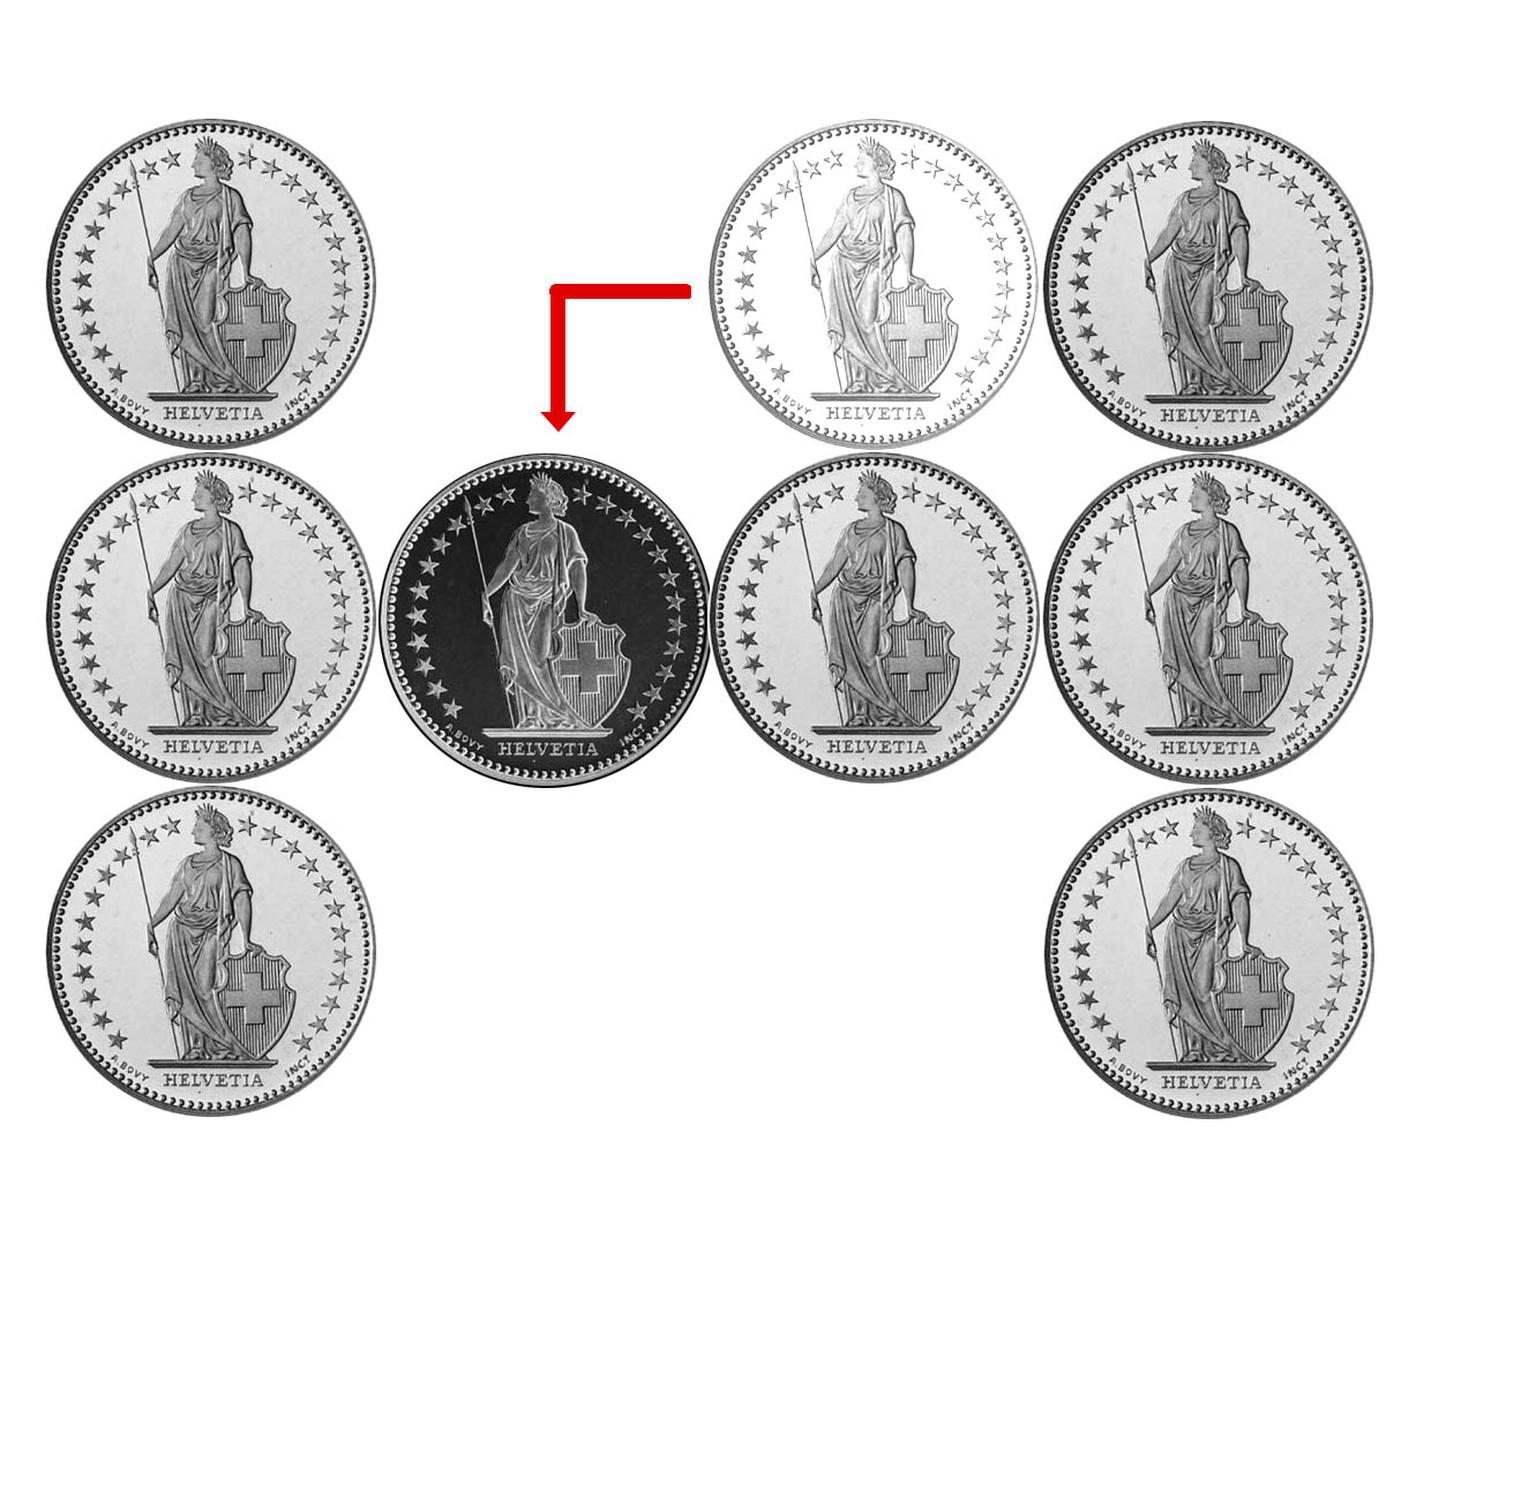 russische münze kreuzworträtsel